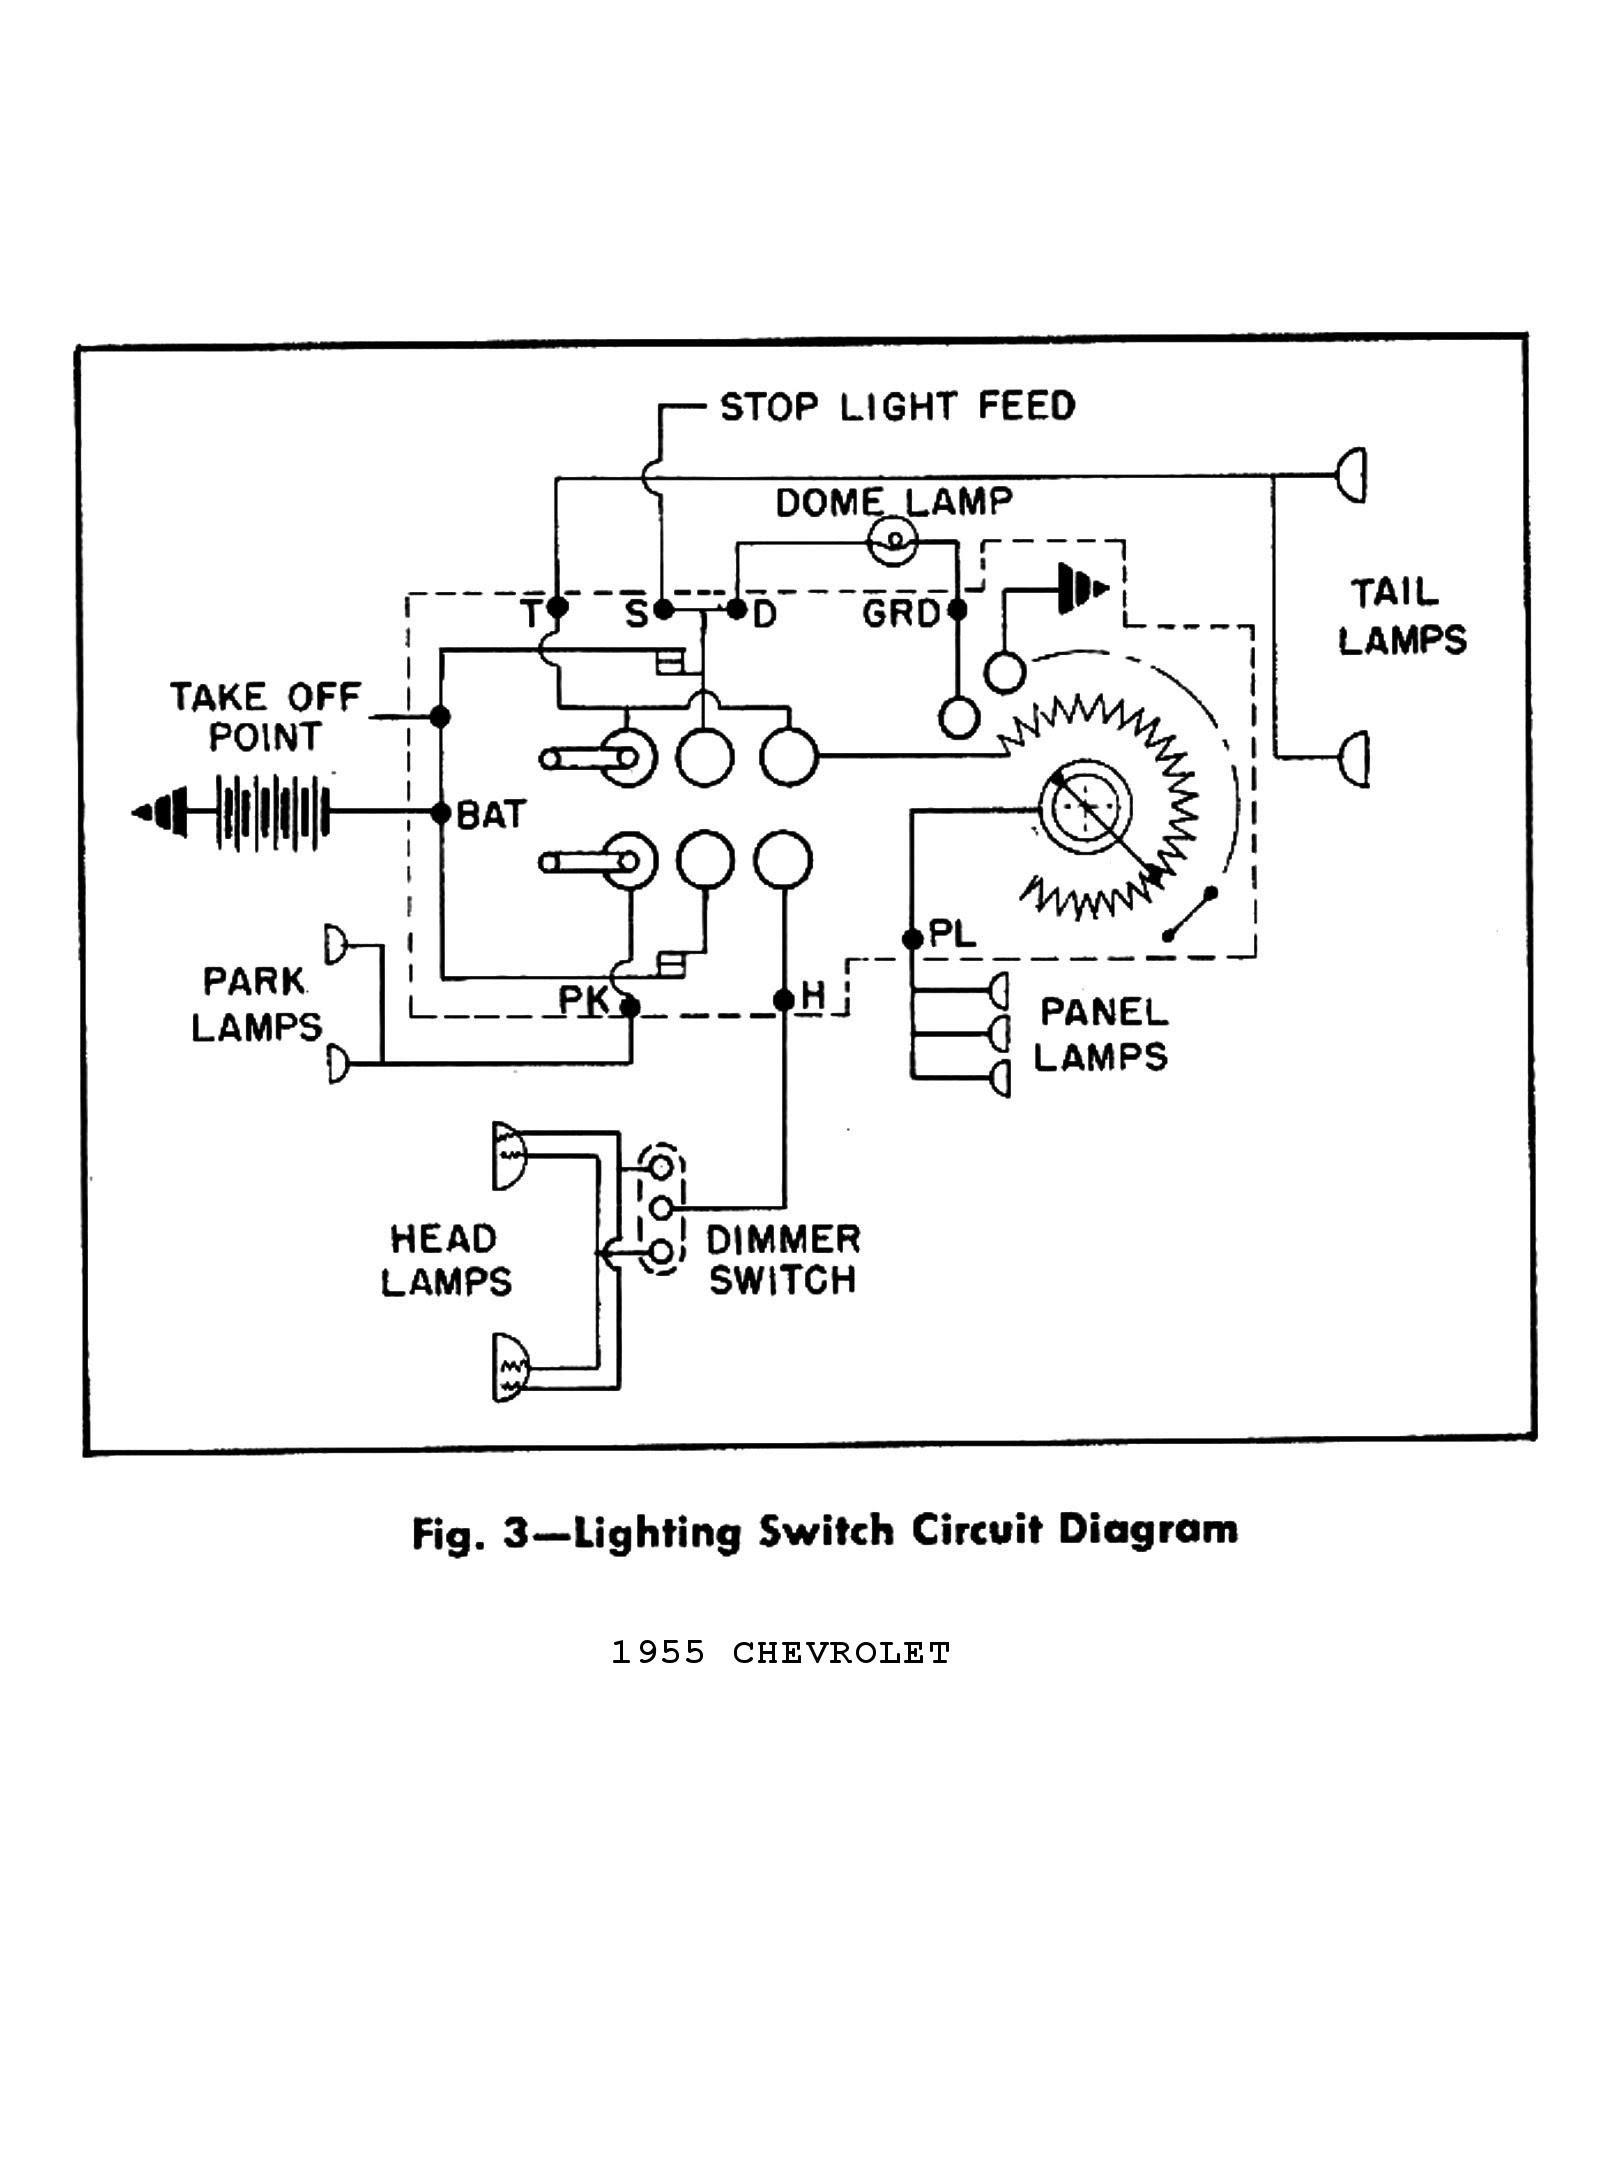 4 Pole Ignition Switch Wiring Diagram - Database